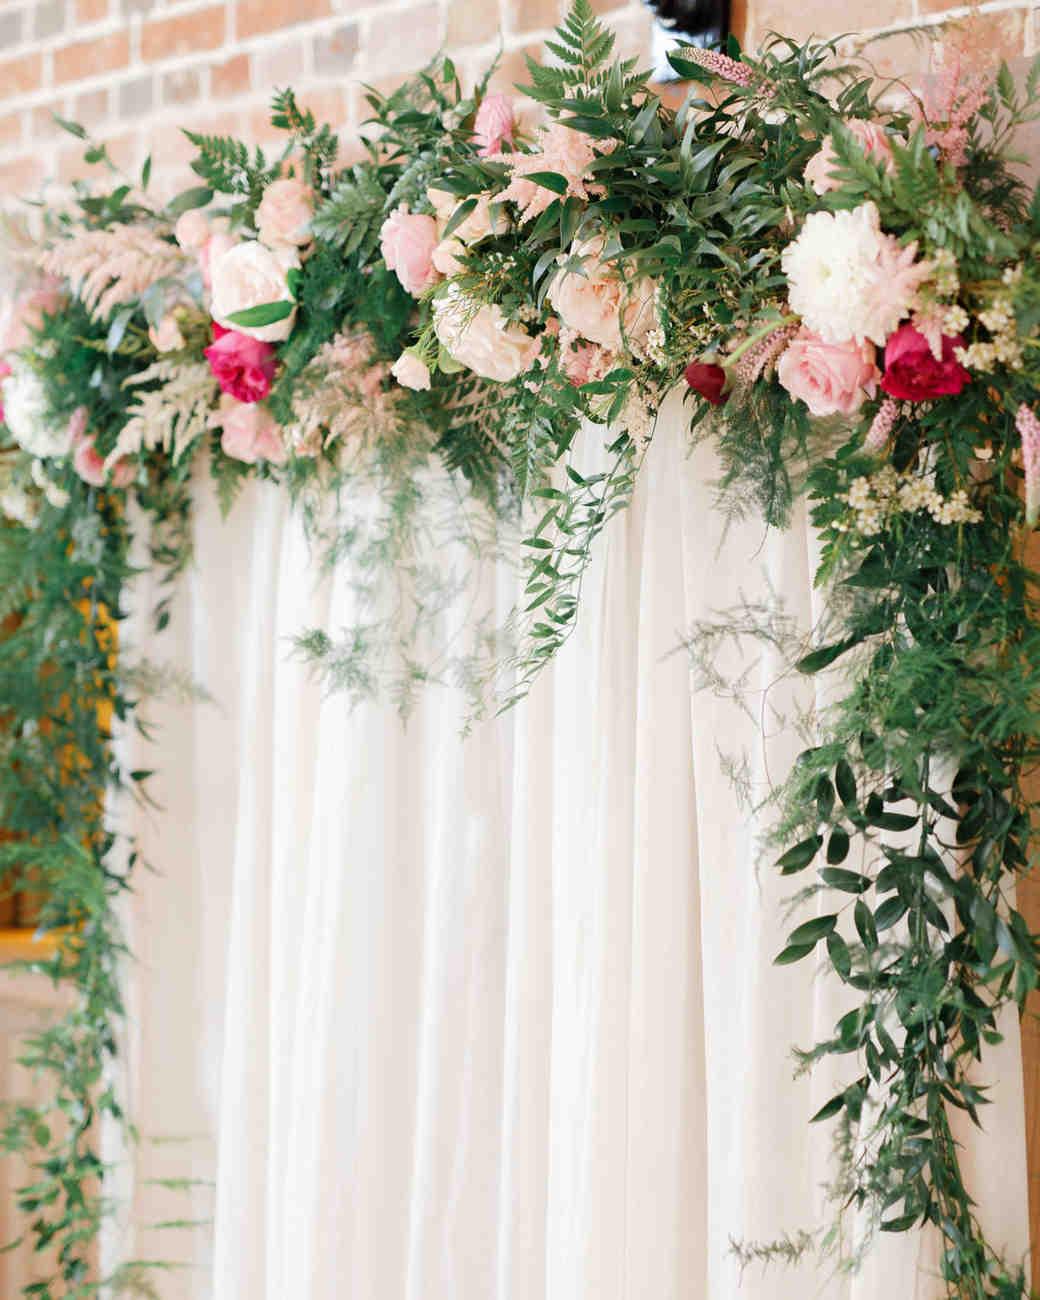 ryan thomas wedding arch with flowers